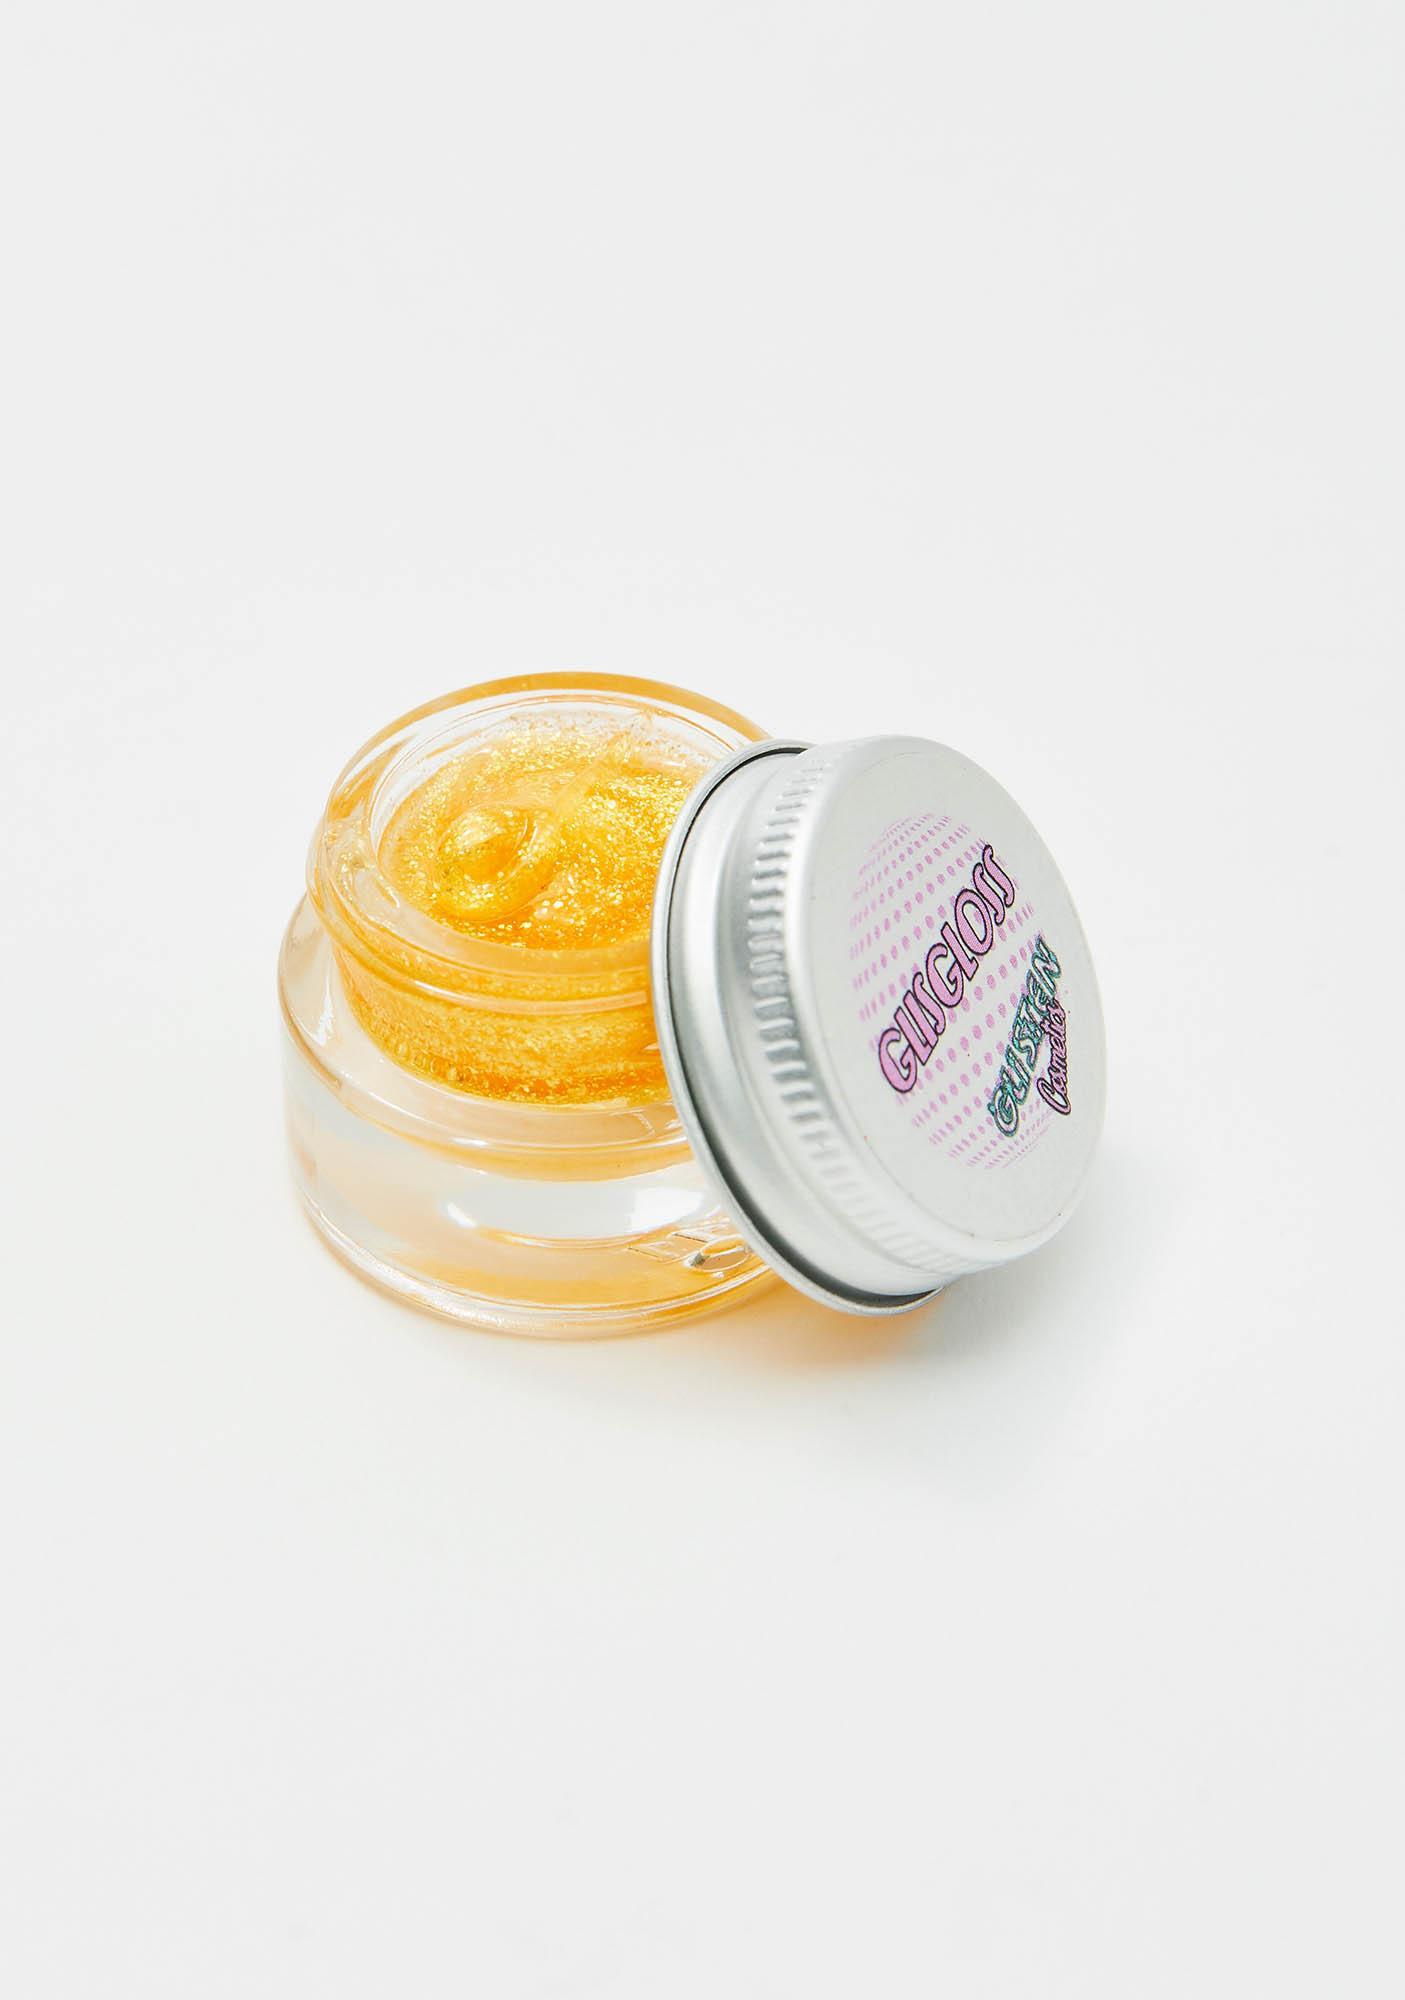 Glisten Cosmetics Glisgloss Honeymoon